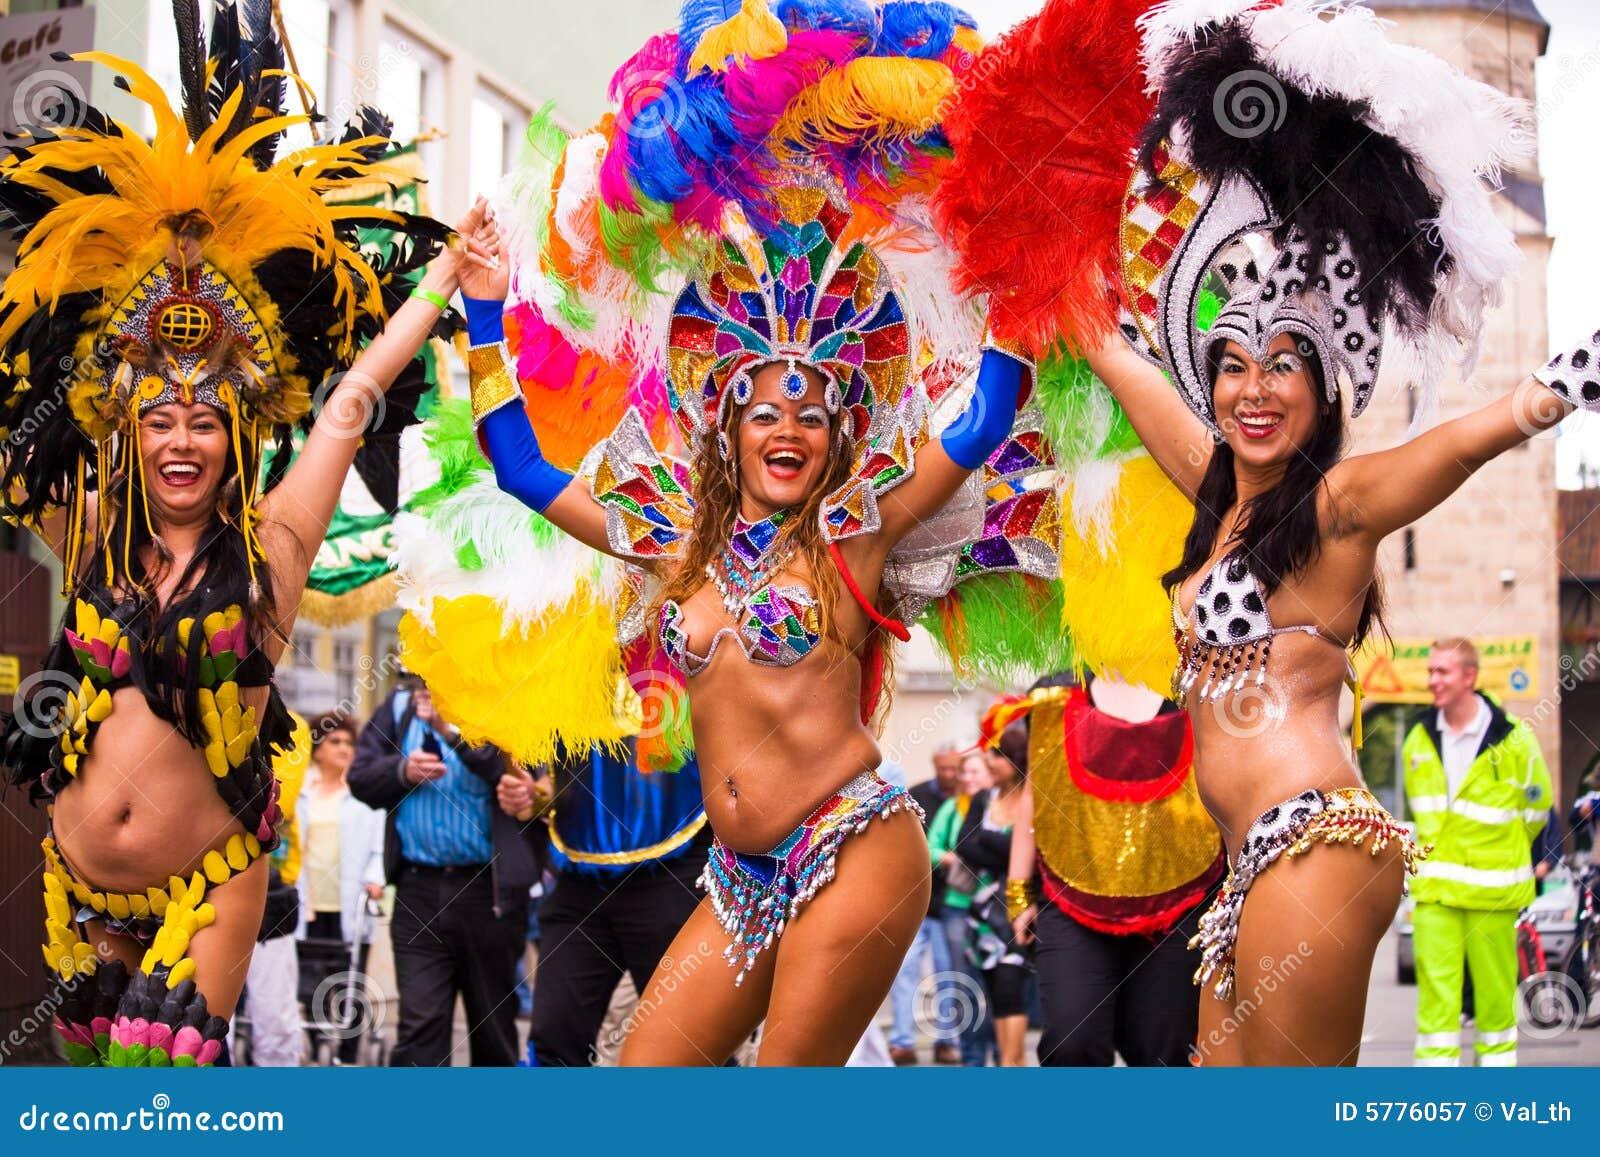 Carnaval De Samba Dans Cobourg 5 Photographie éditorial ...